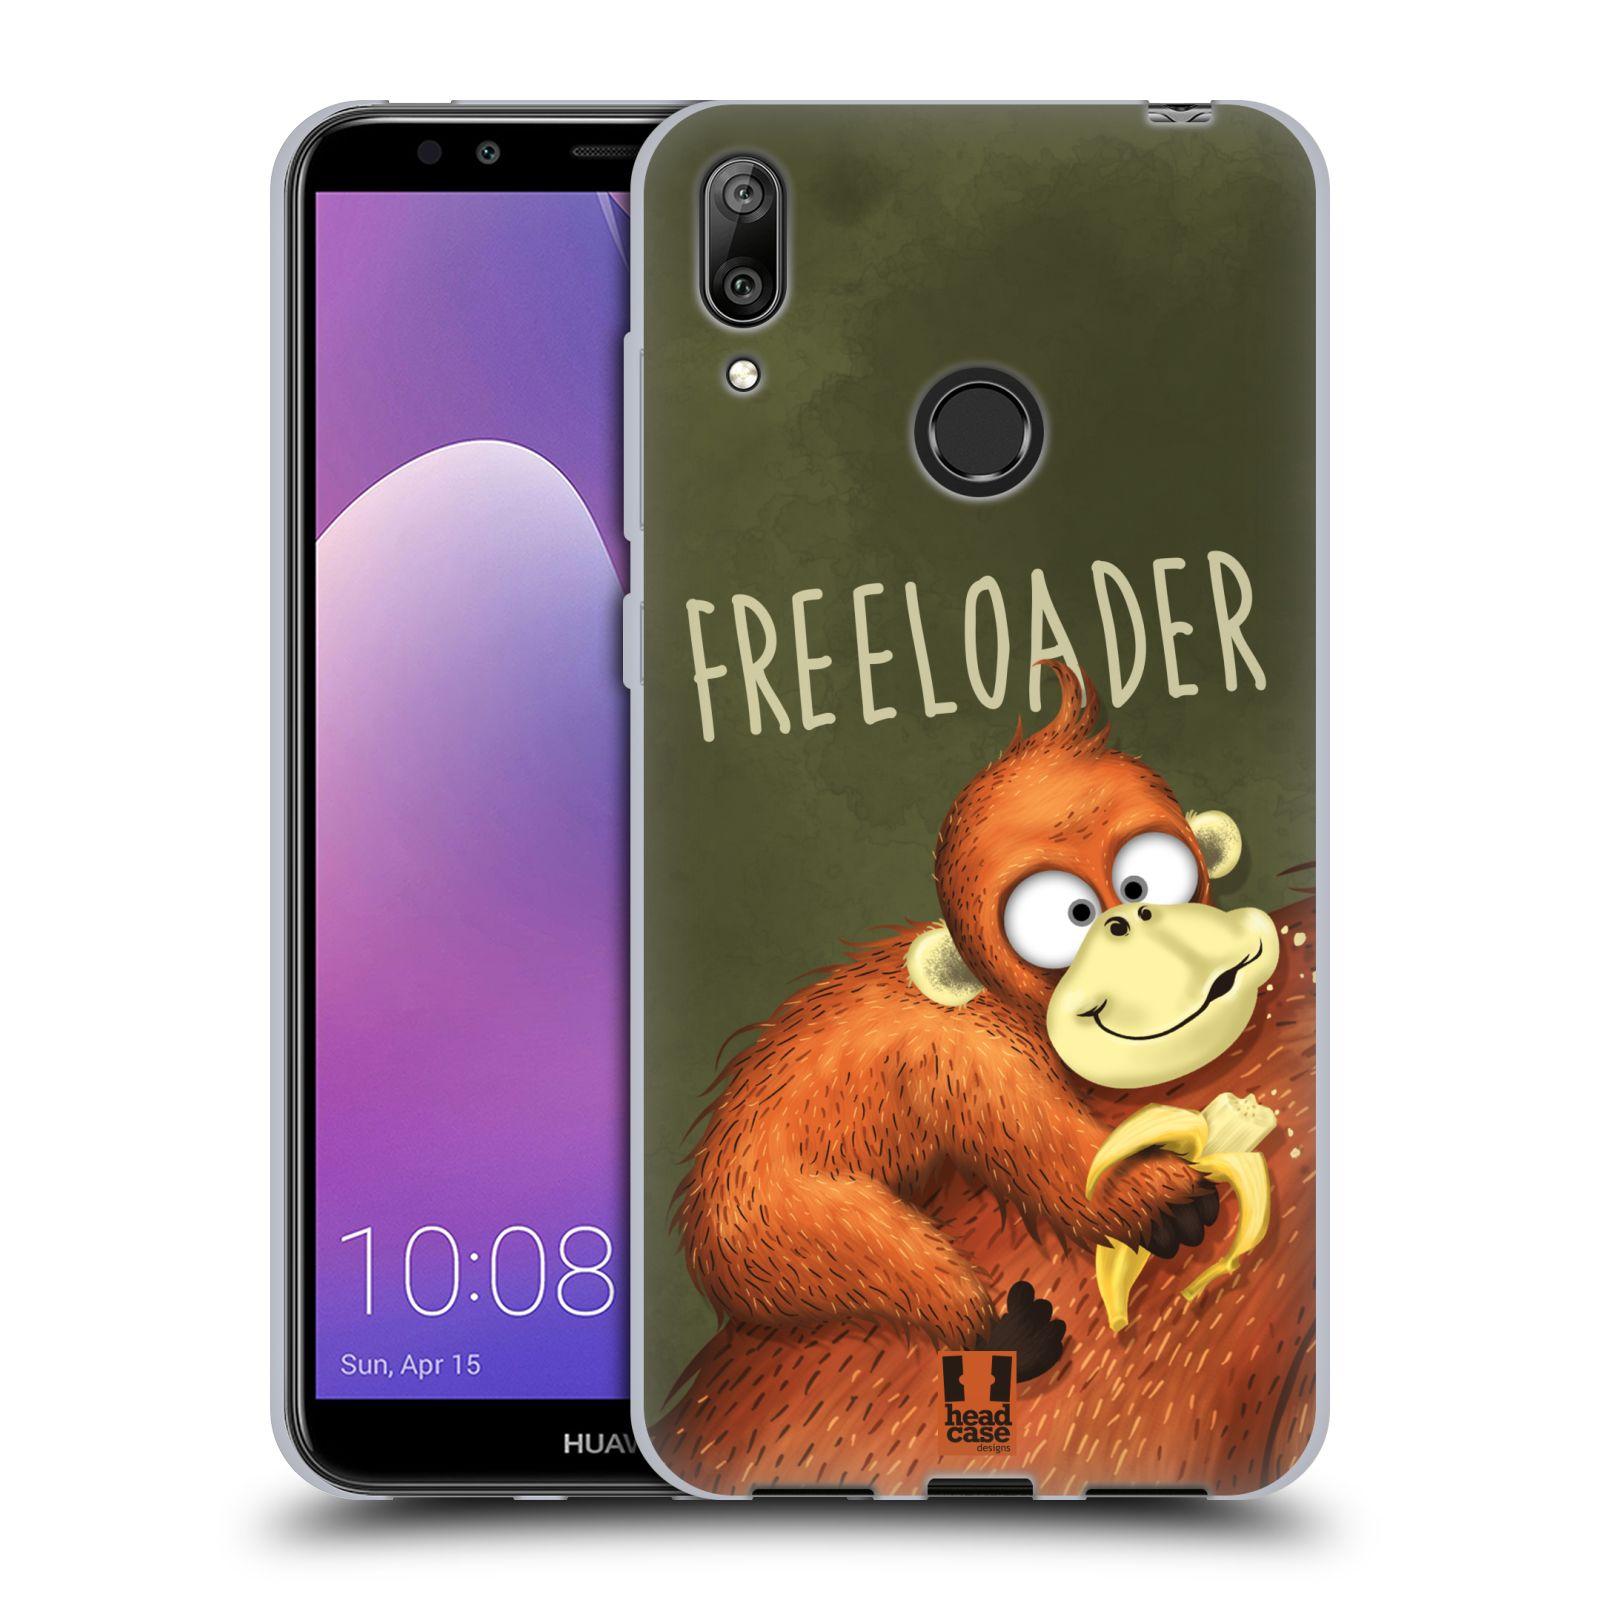 Silikonové pouzdro na mobil Huawei Y7 (2019) - Head Case - Opičák Freeloader